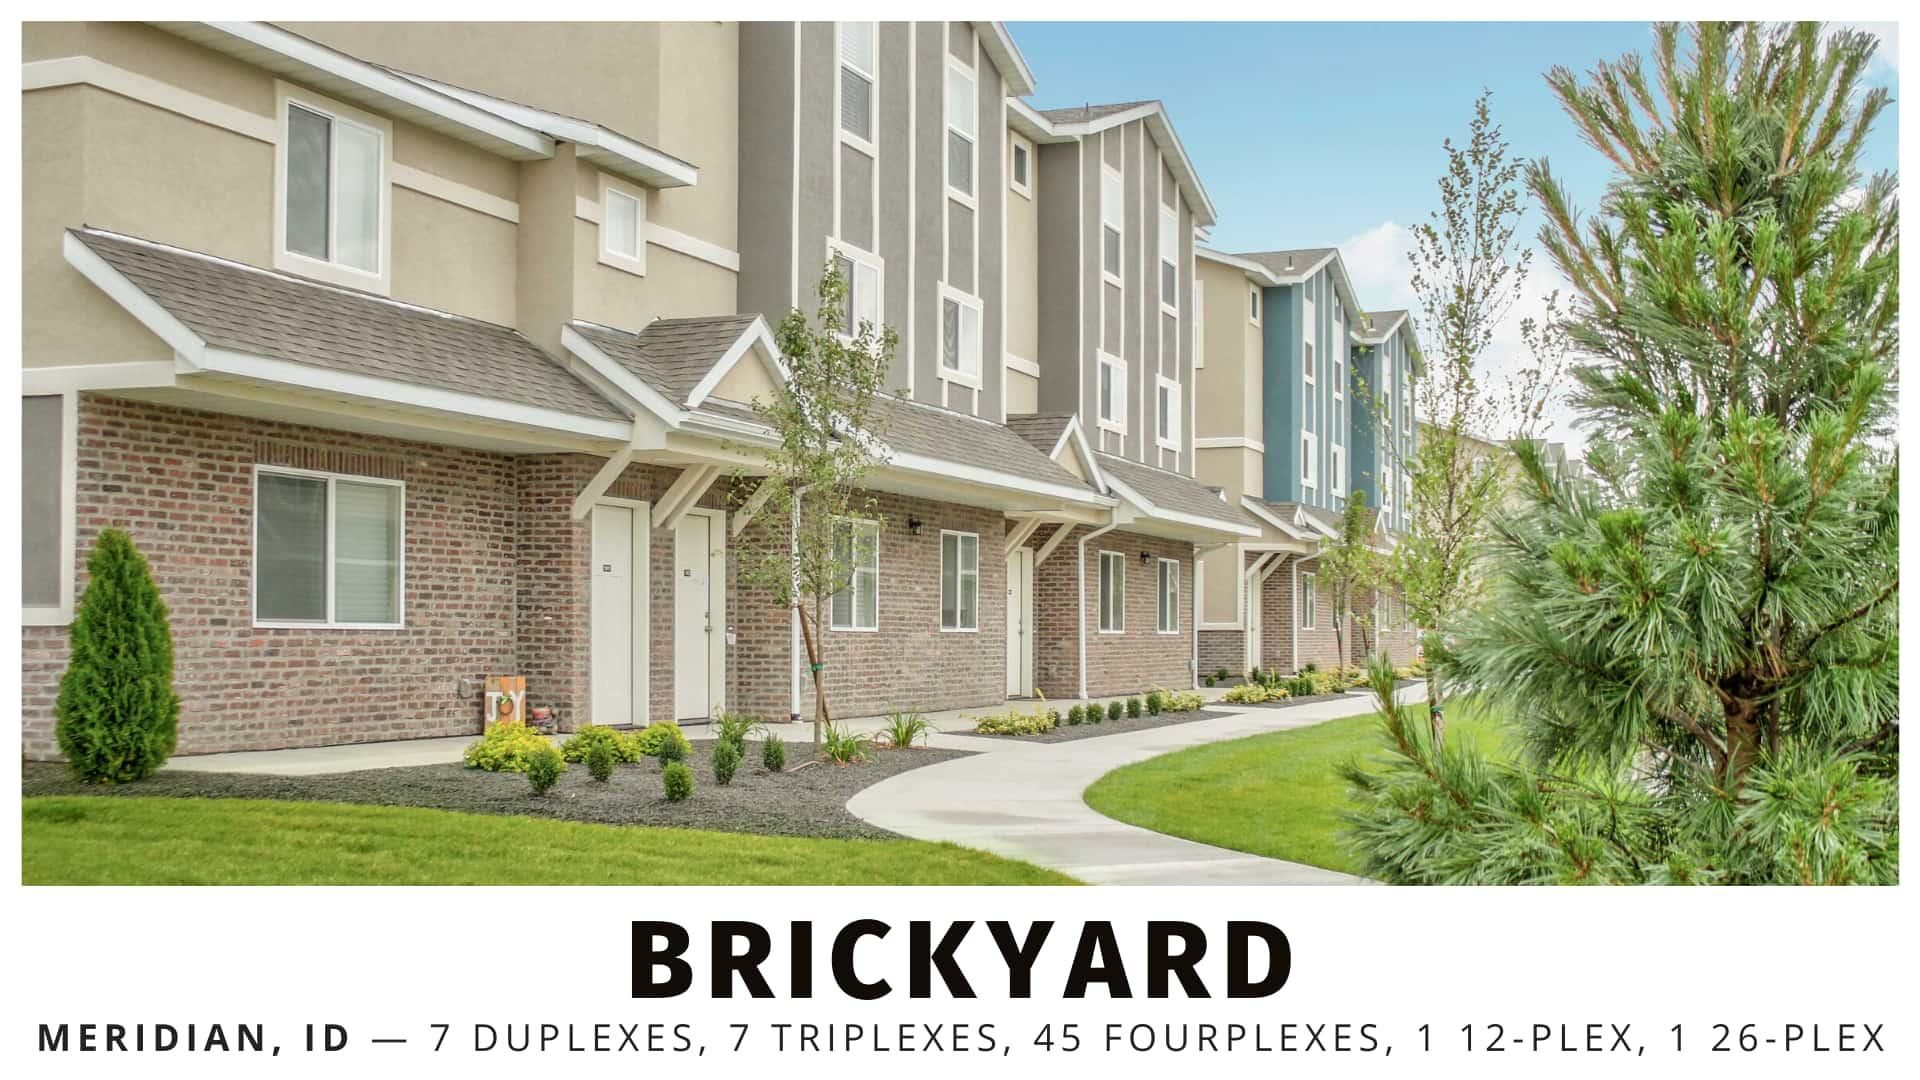 Brickyard multifamily in the Boise, Idaho Metro